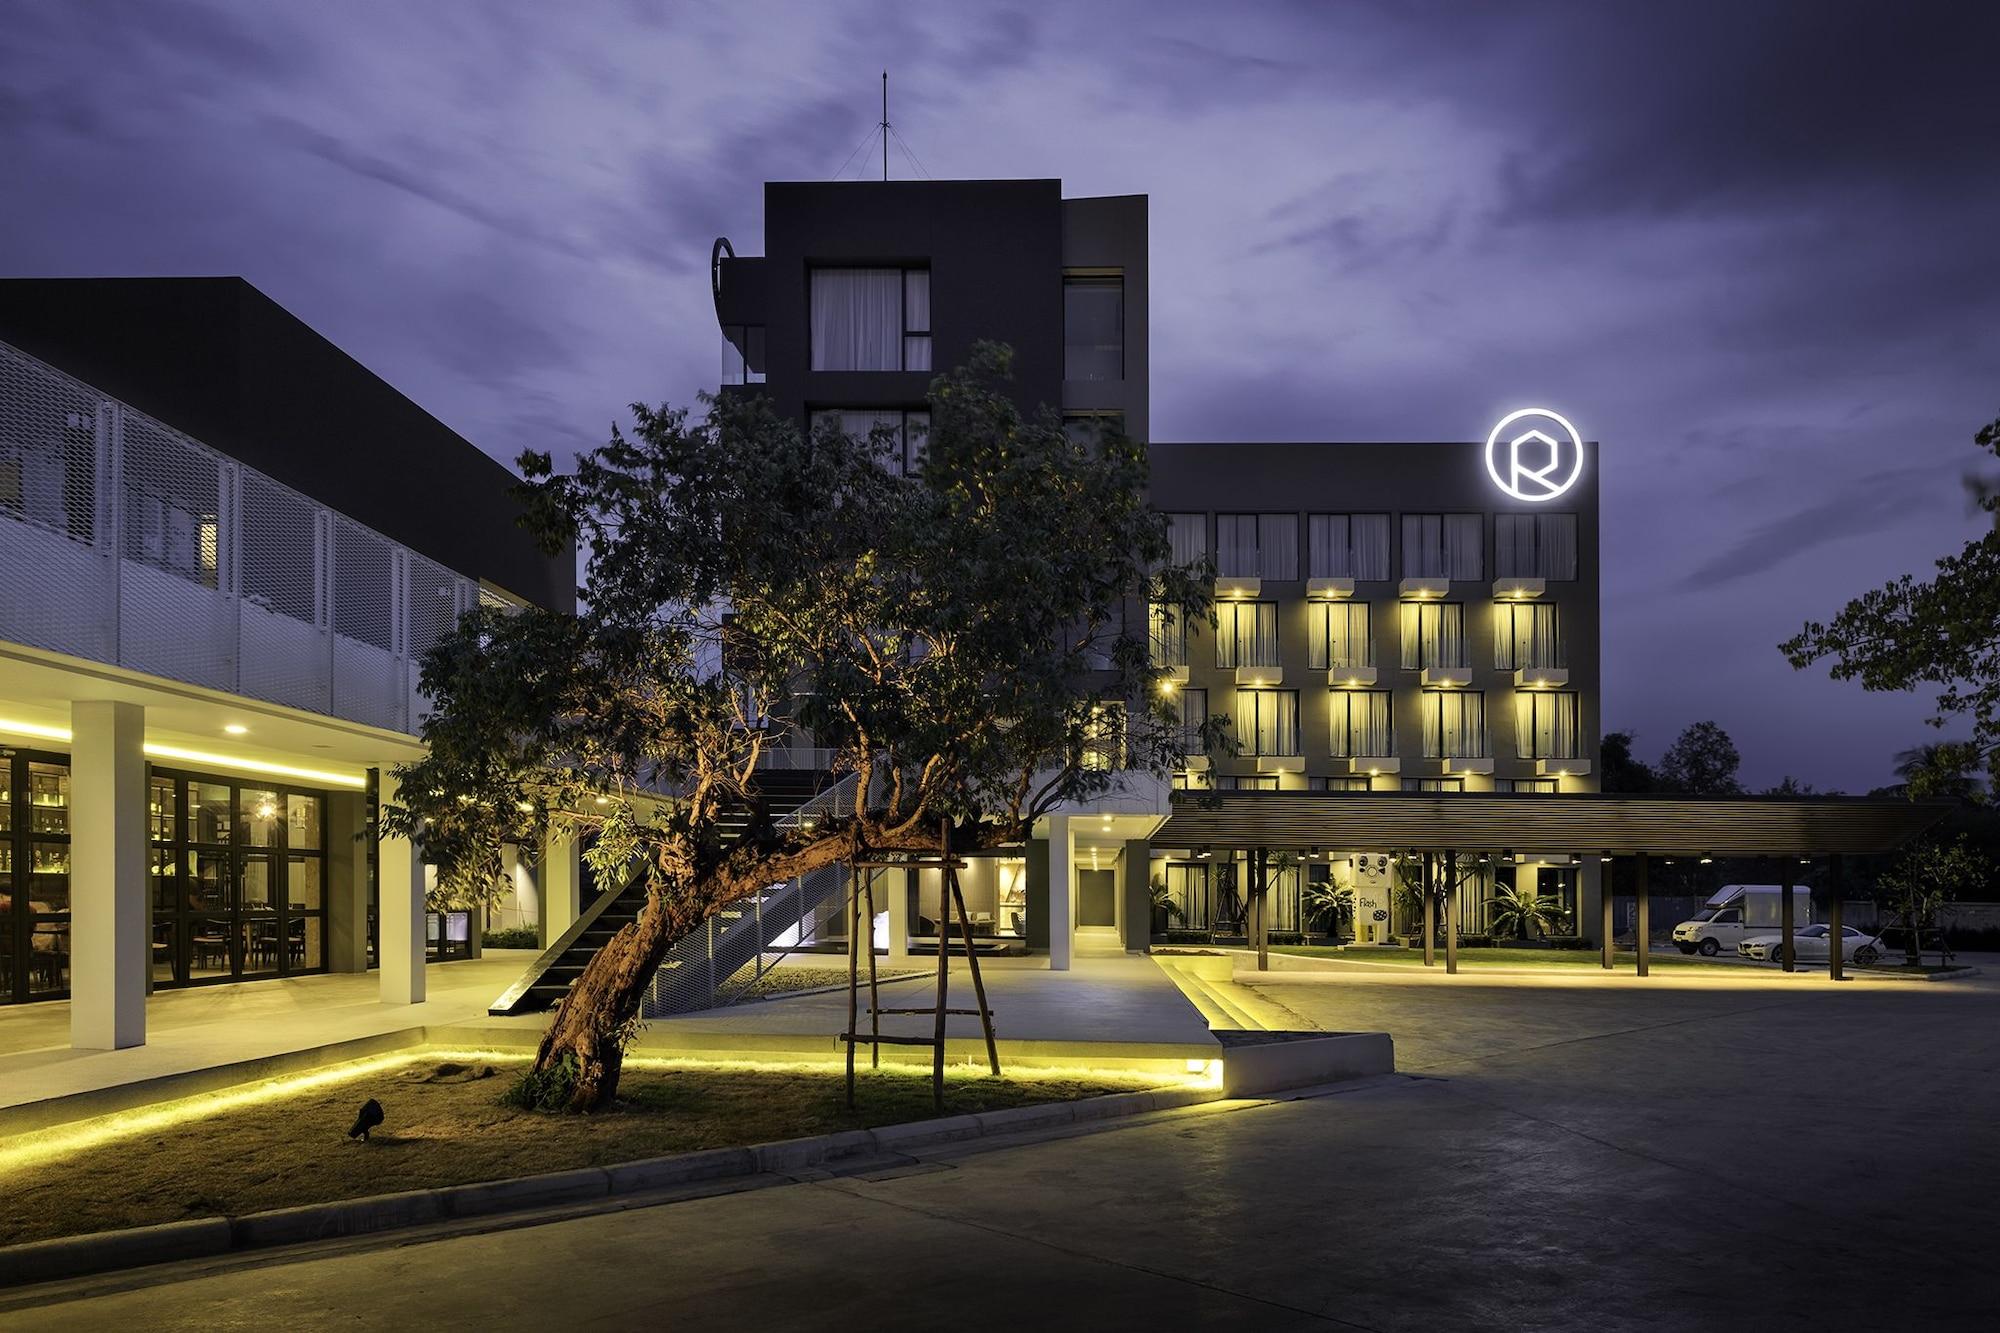 R Photo Hotel, Muang Nakhon Phanom